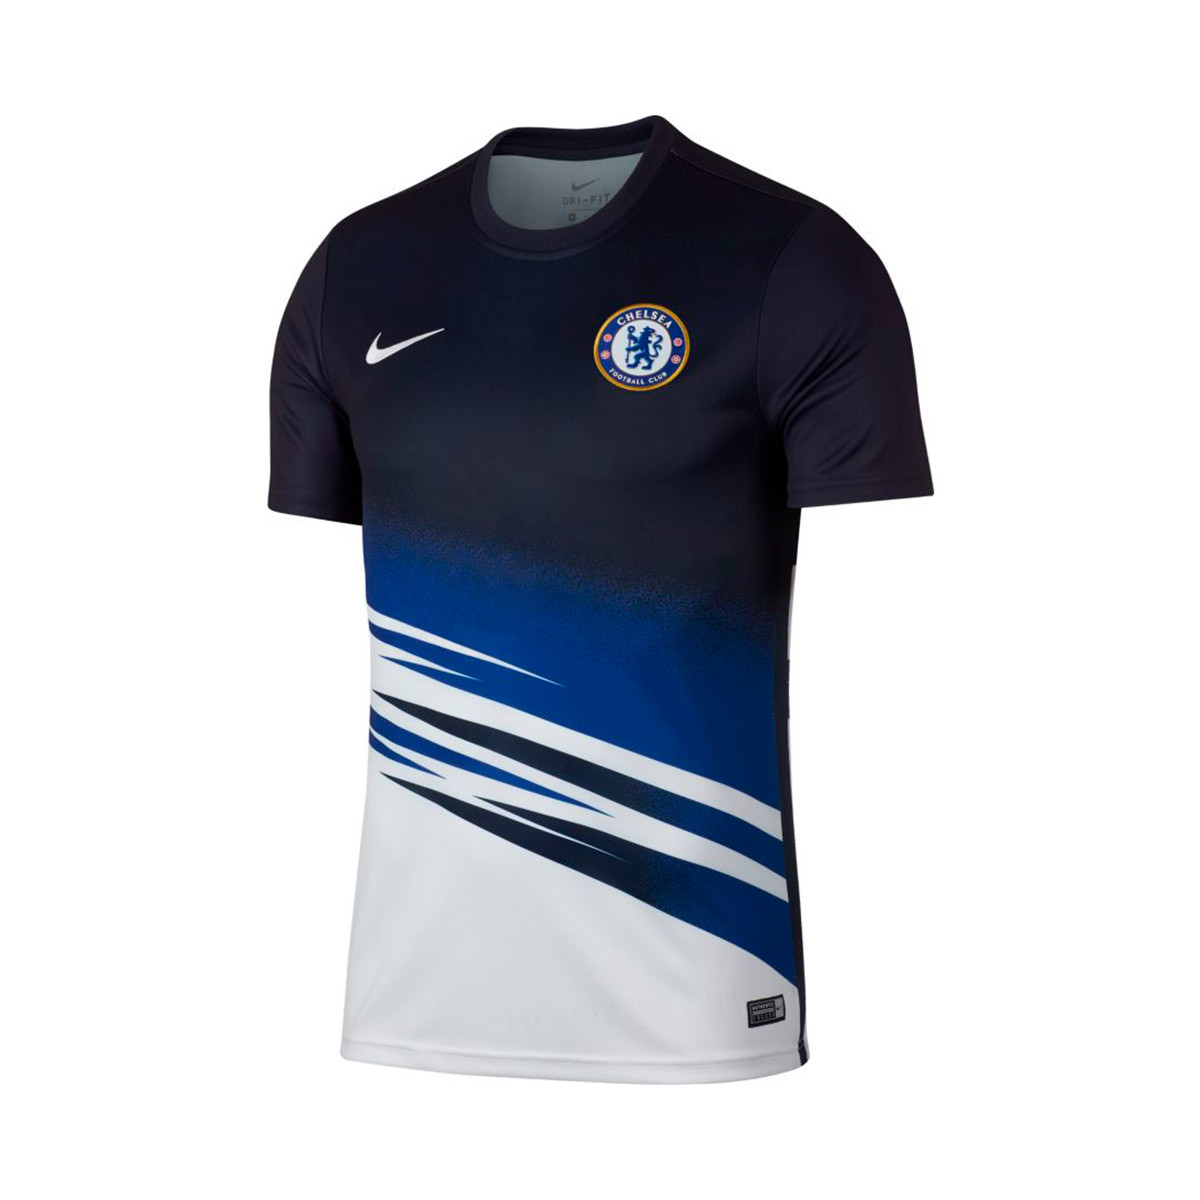 Jersey Nike Chelsea Fc Dry 2019 2020 White Obsidian Football Store Futbol Emotion